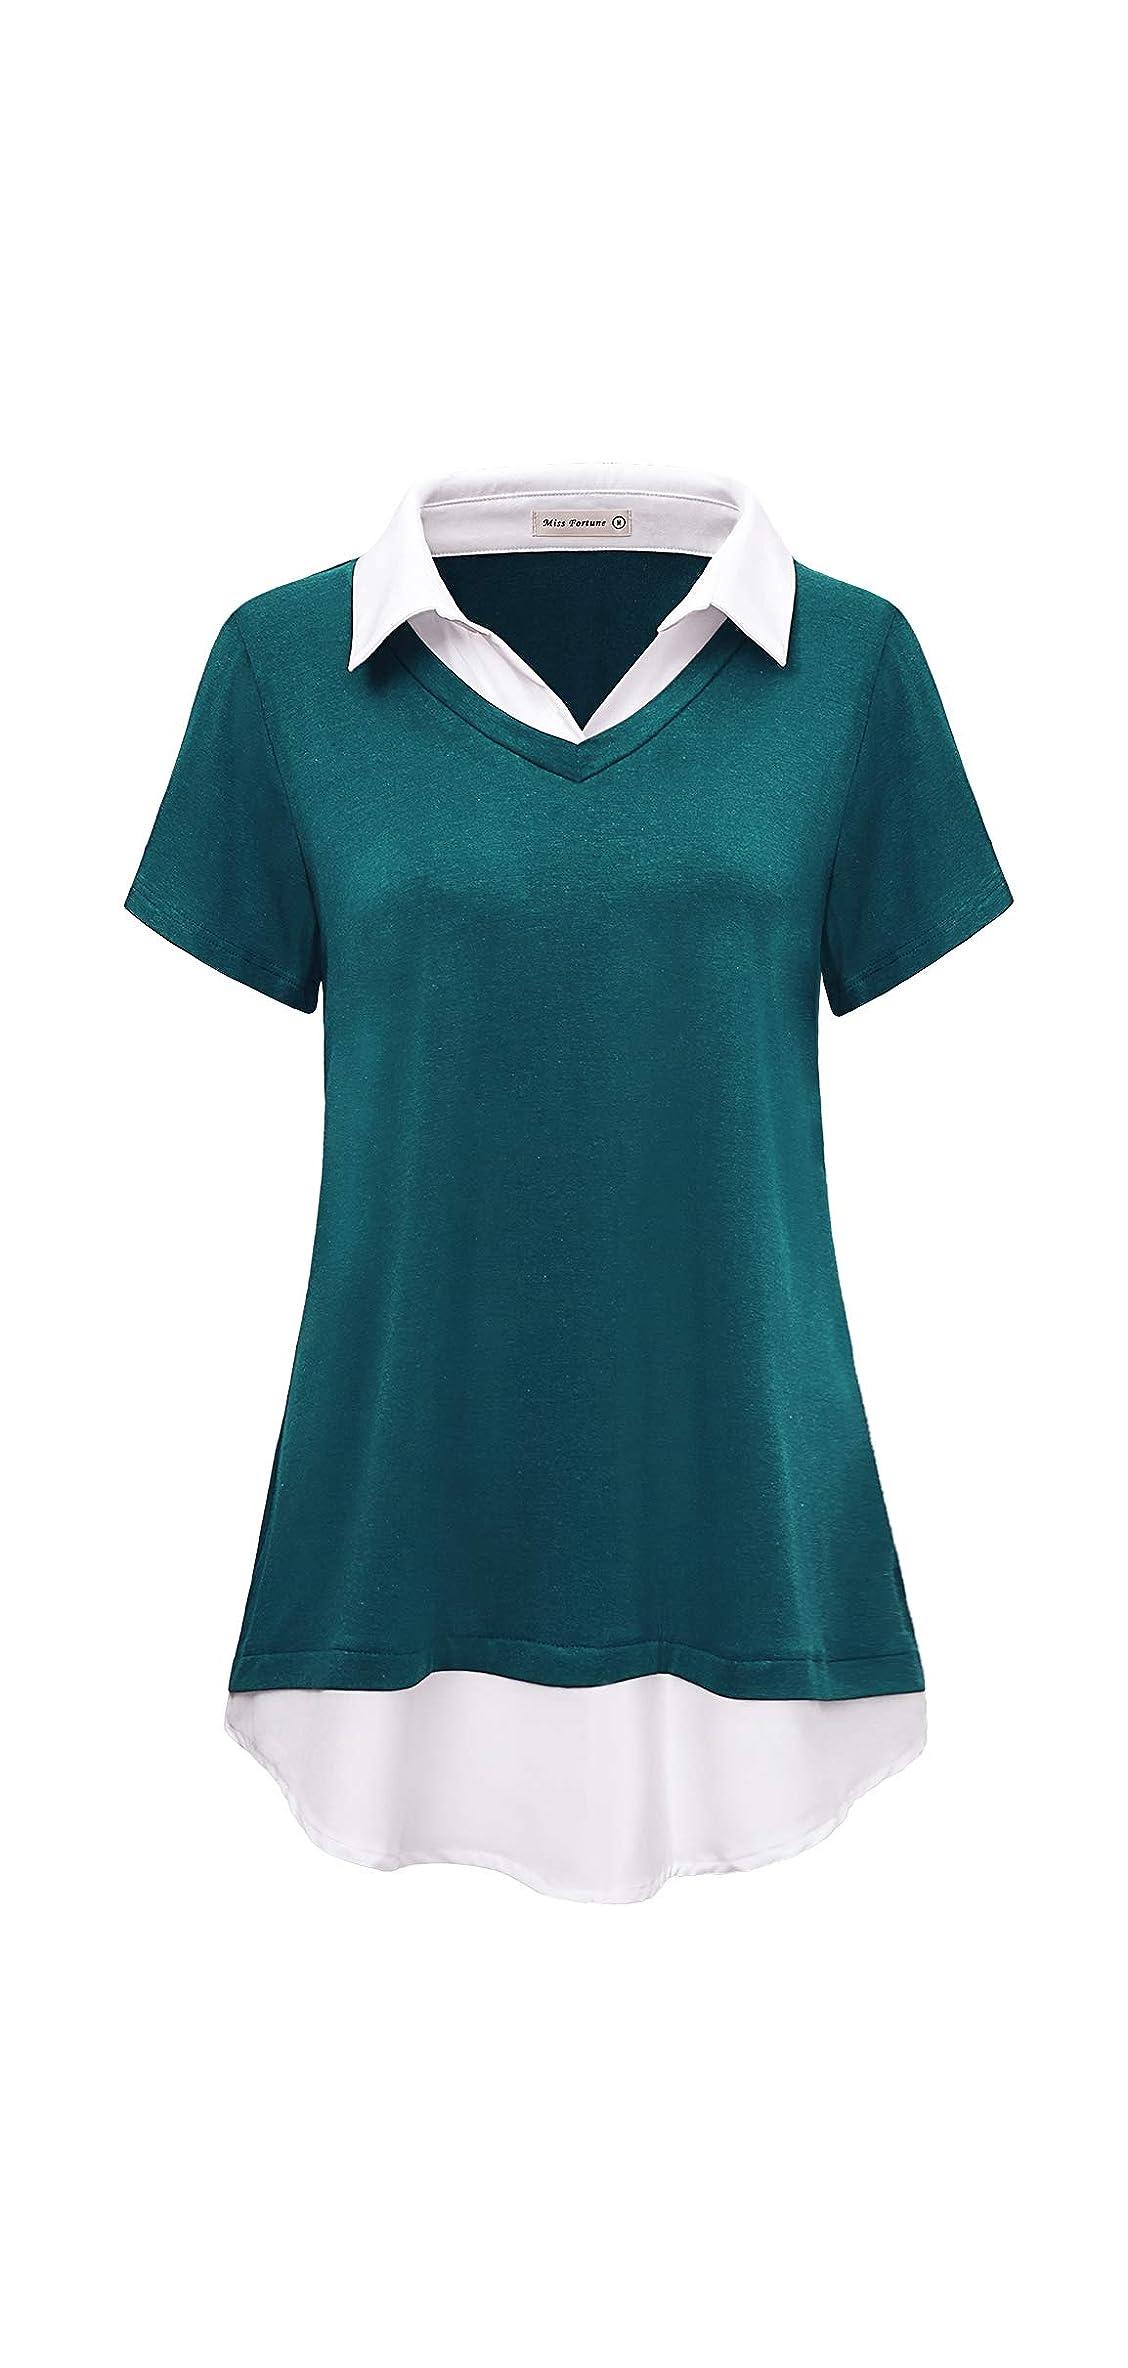 Women's Contrast Collar Short Sleeve Tunic Casual